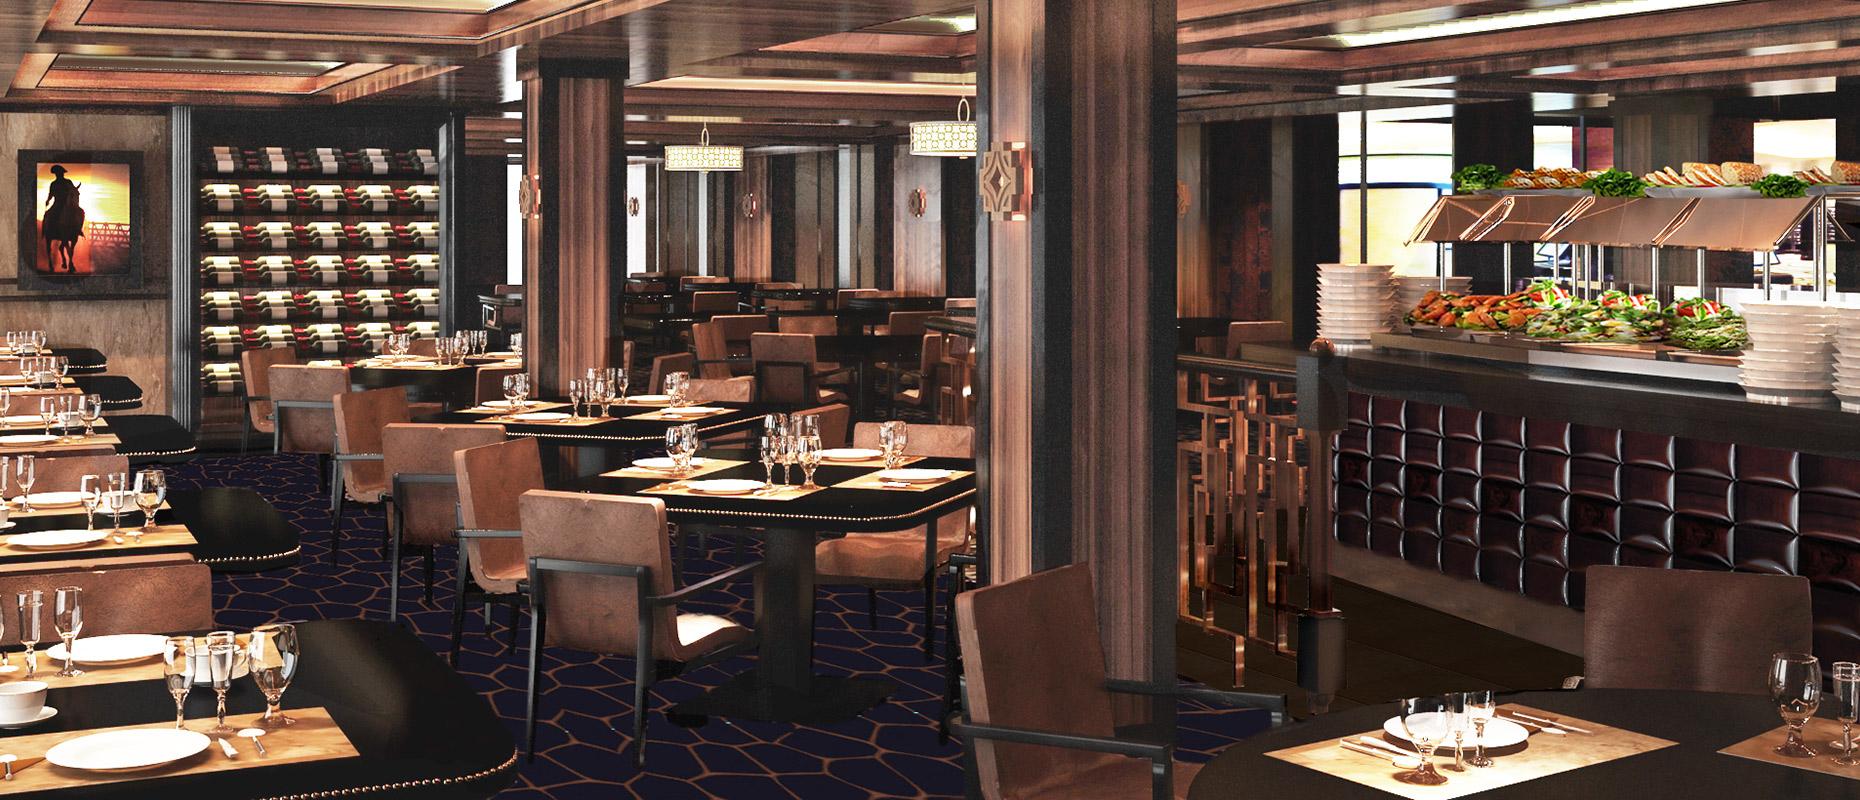 Norwegian Cruise Line Norwegian Escape Interior Moderno.jpg